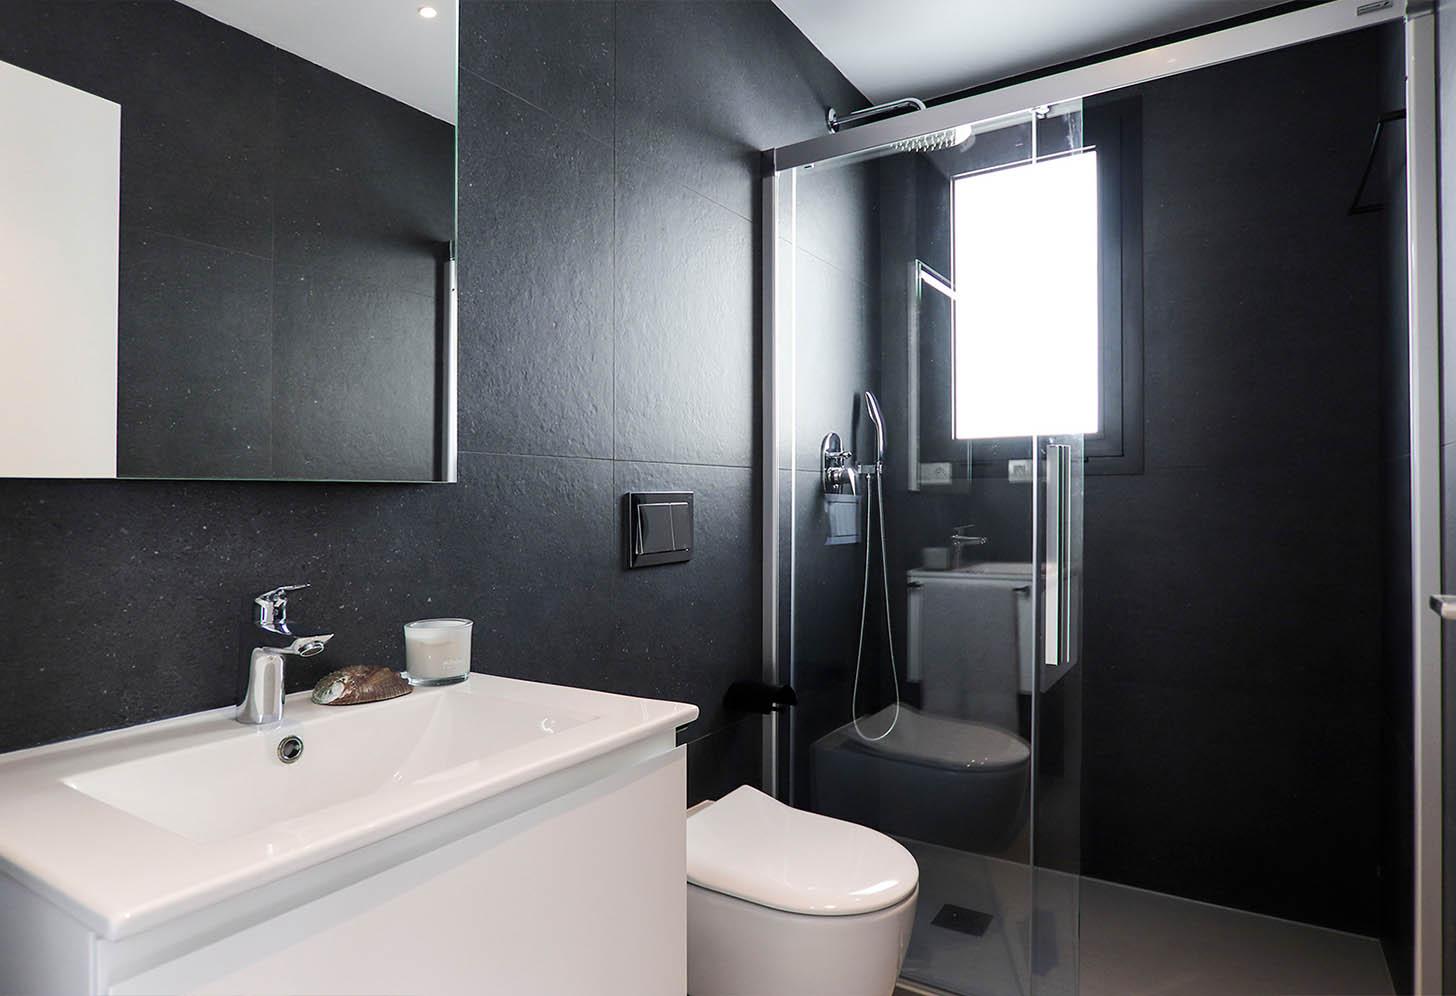 immobilier neuf espagne costa blanca on-3b essence penthouse sdb 2